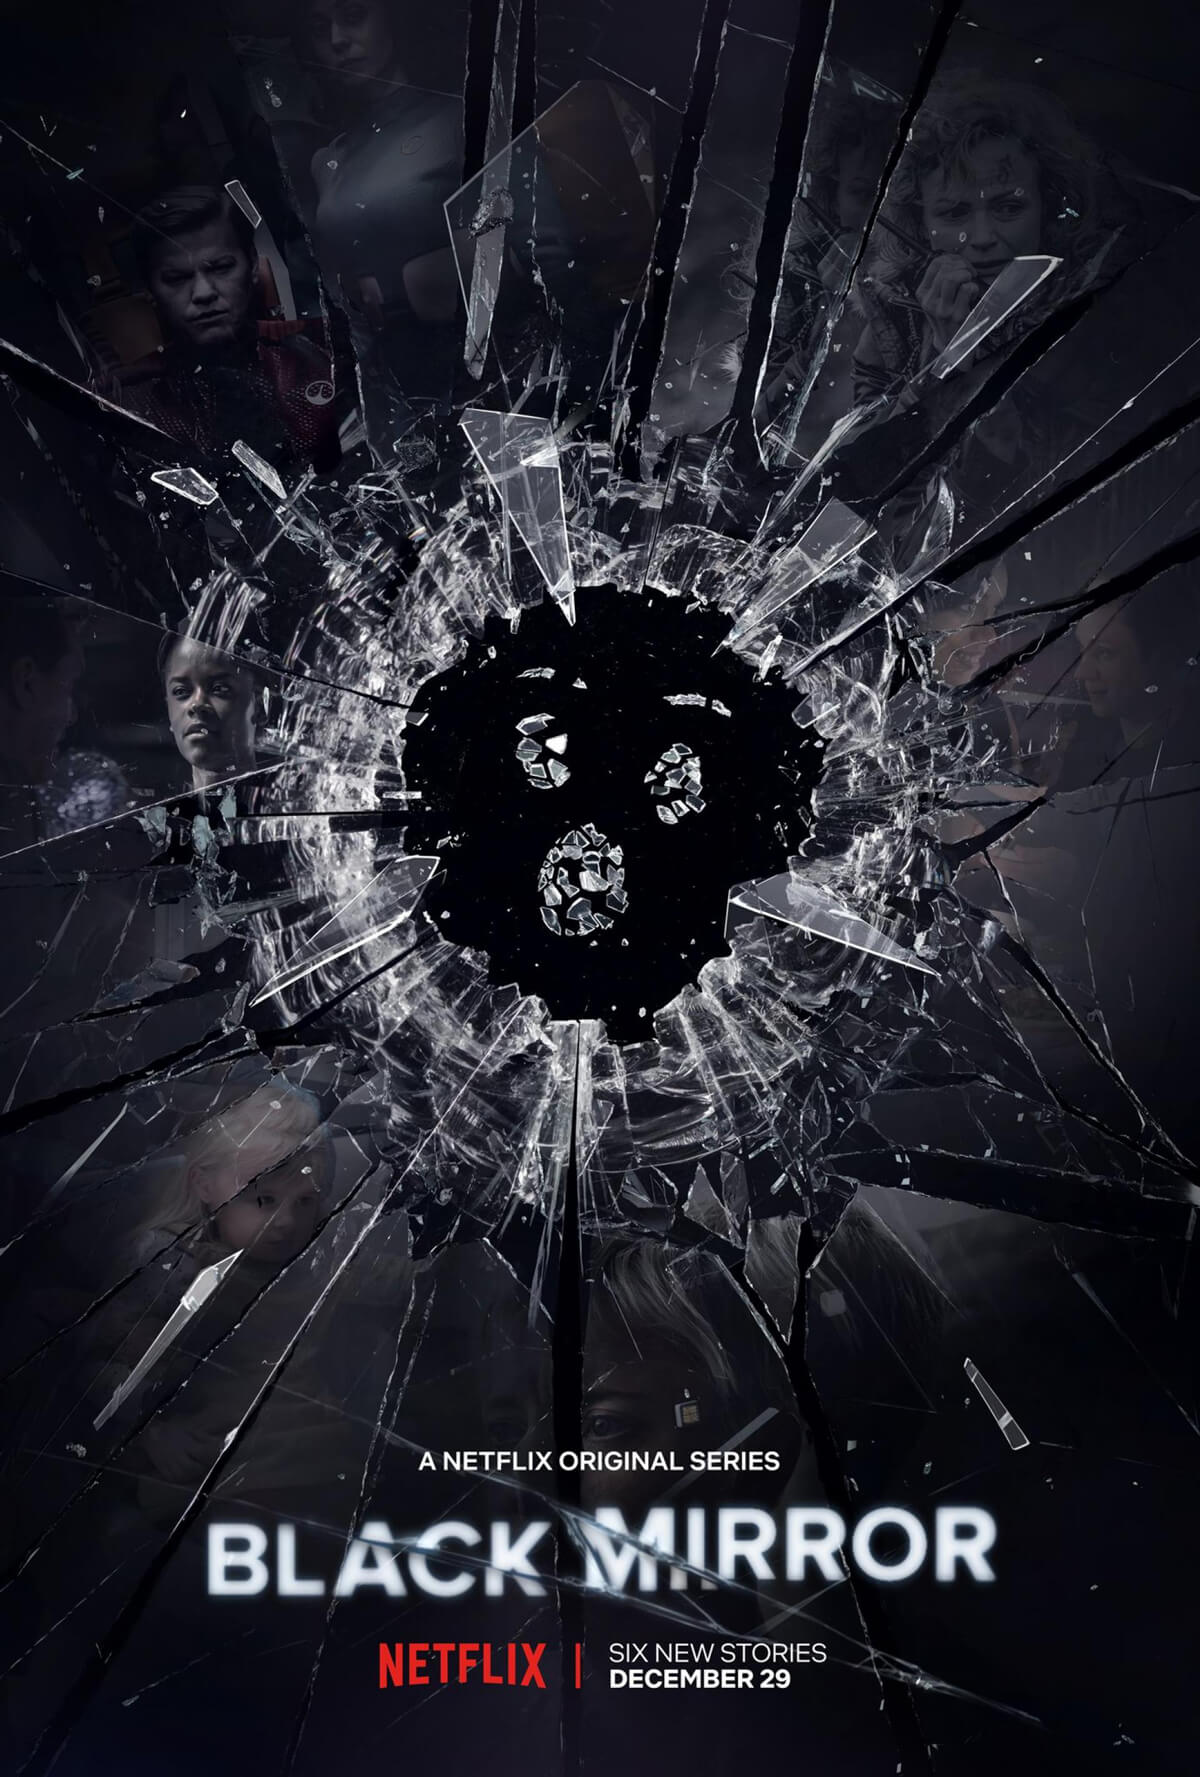 Netflix Black Mirror Season 5 Poster